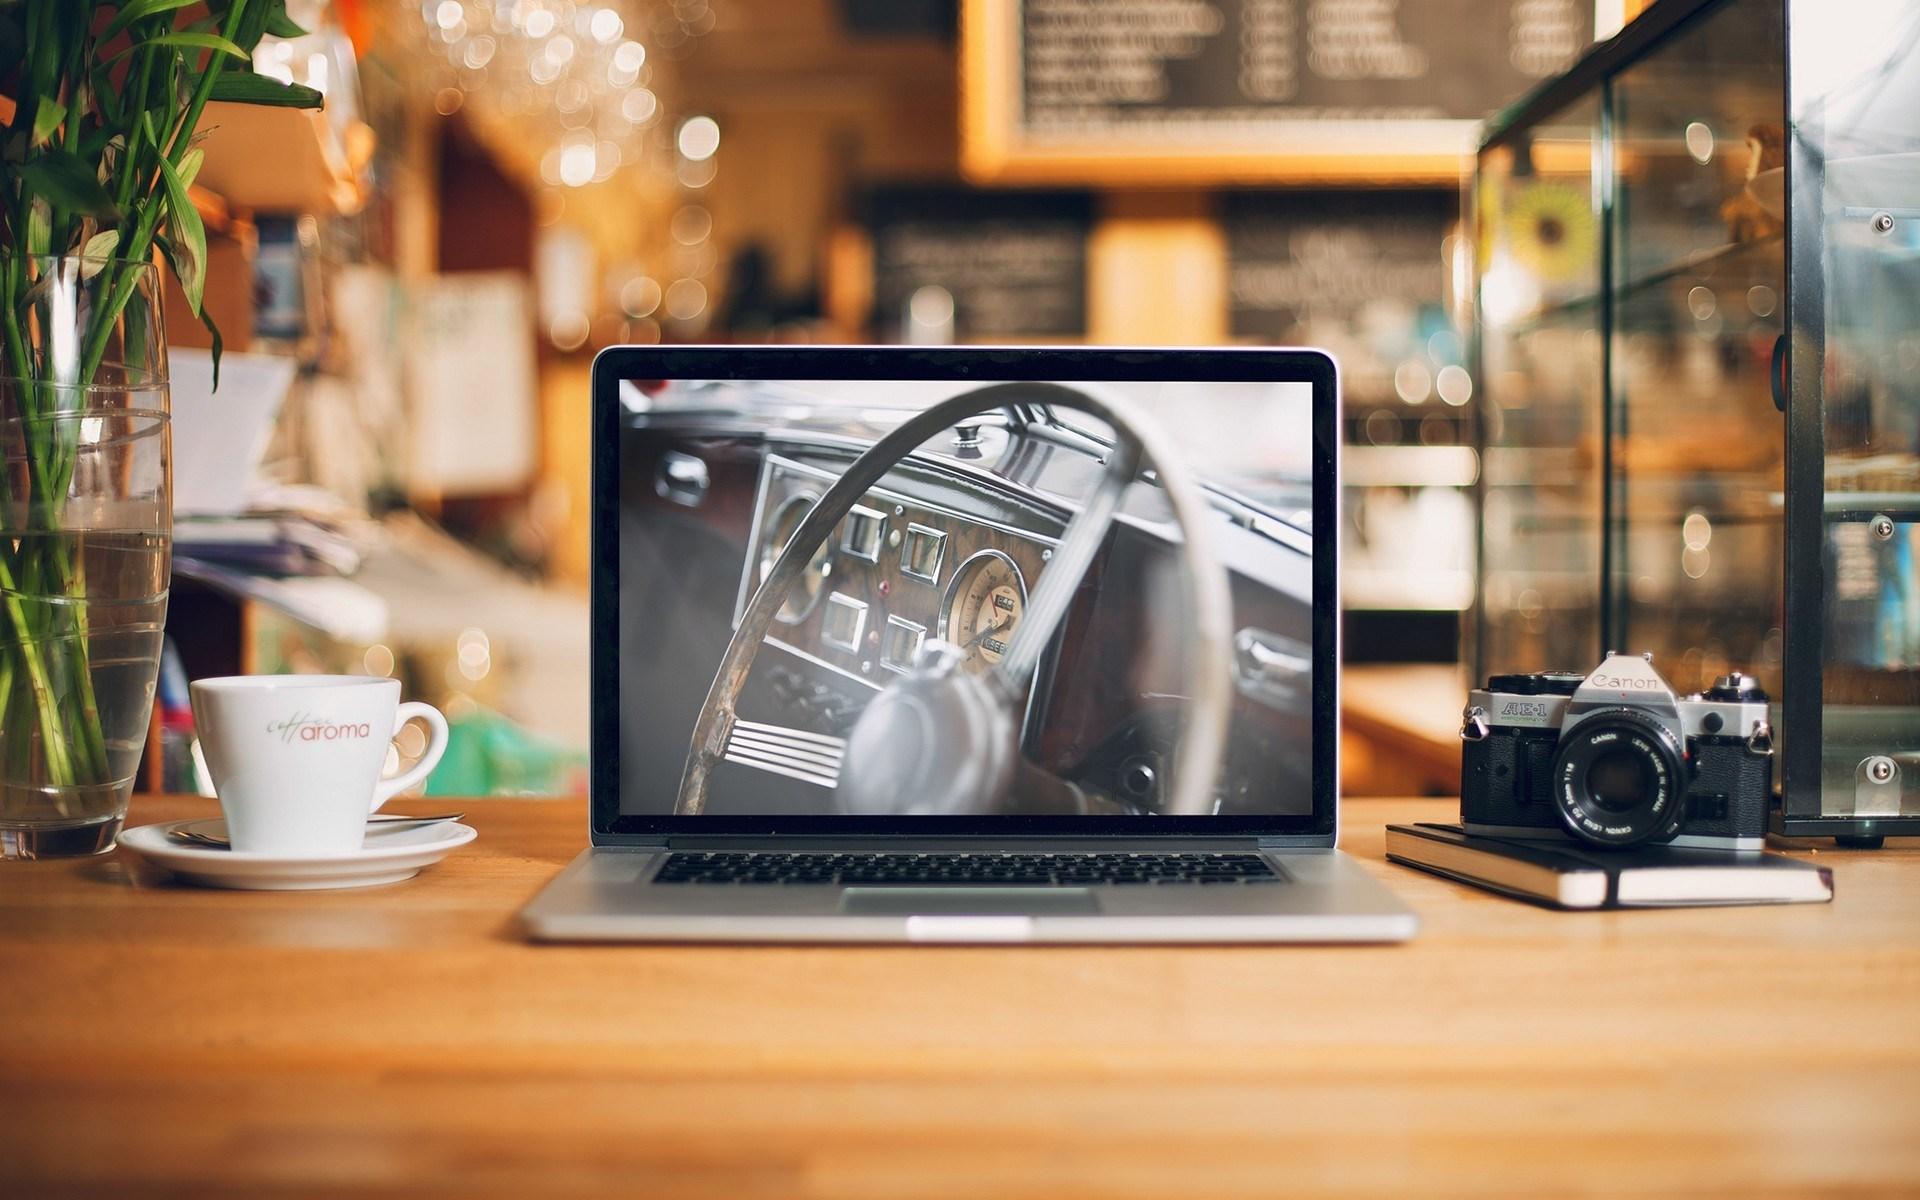 desk-macbook-notebook-camera-canon-photo-1.jpg